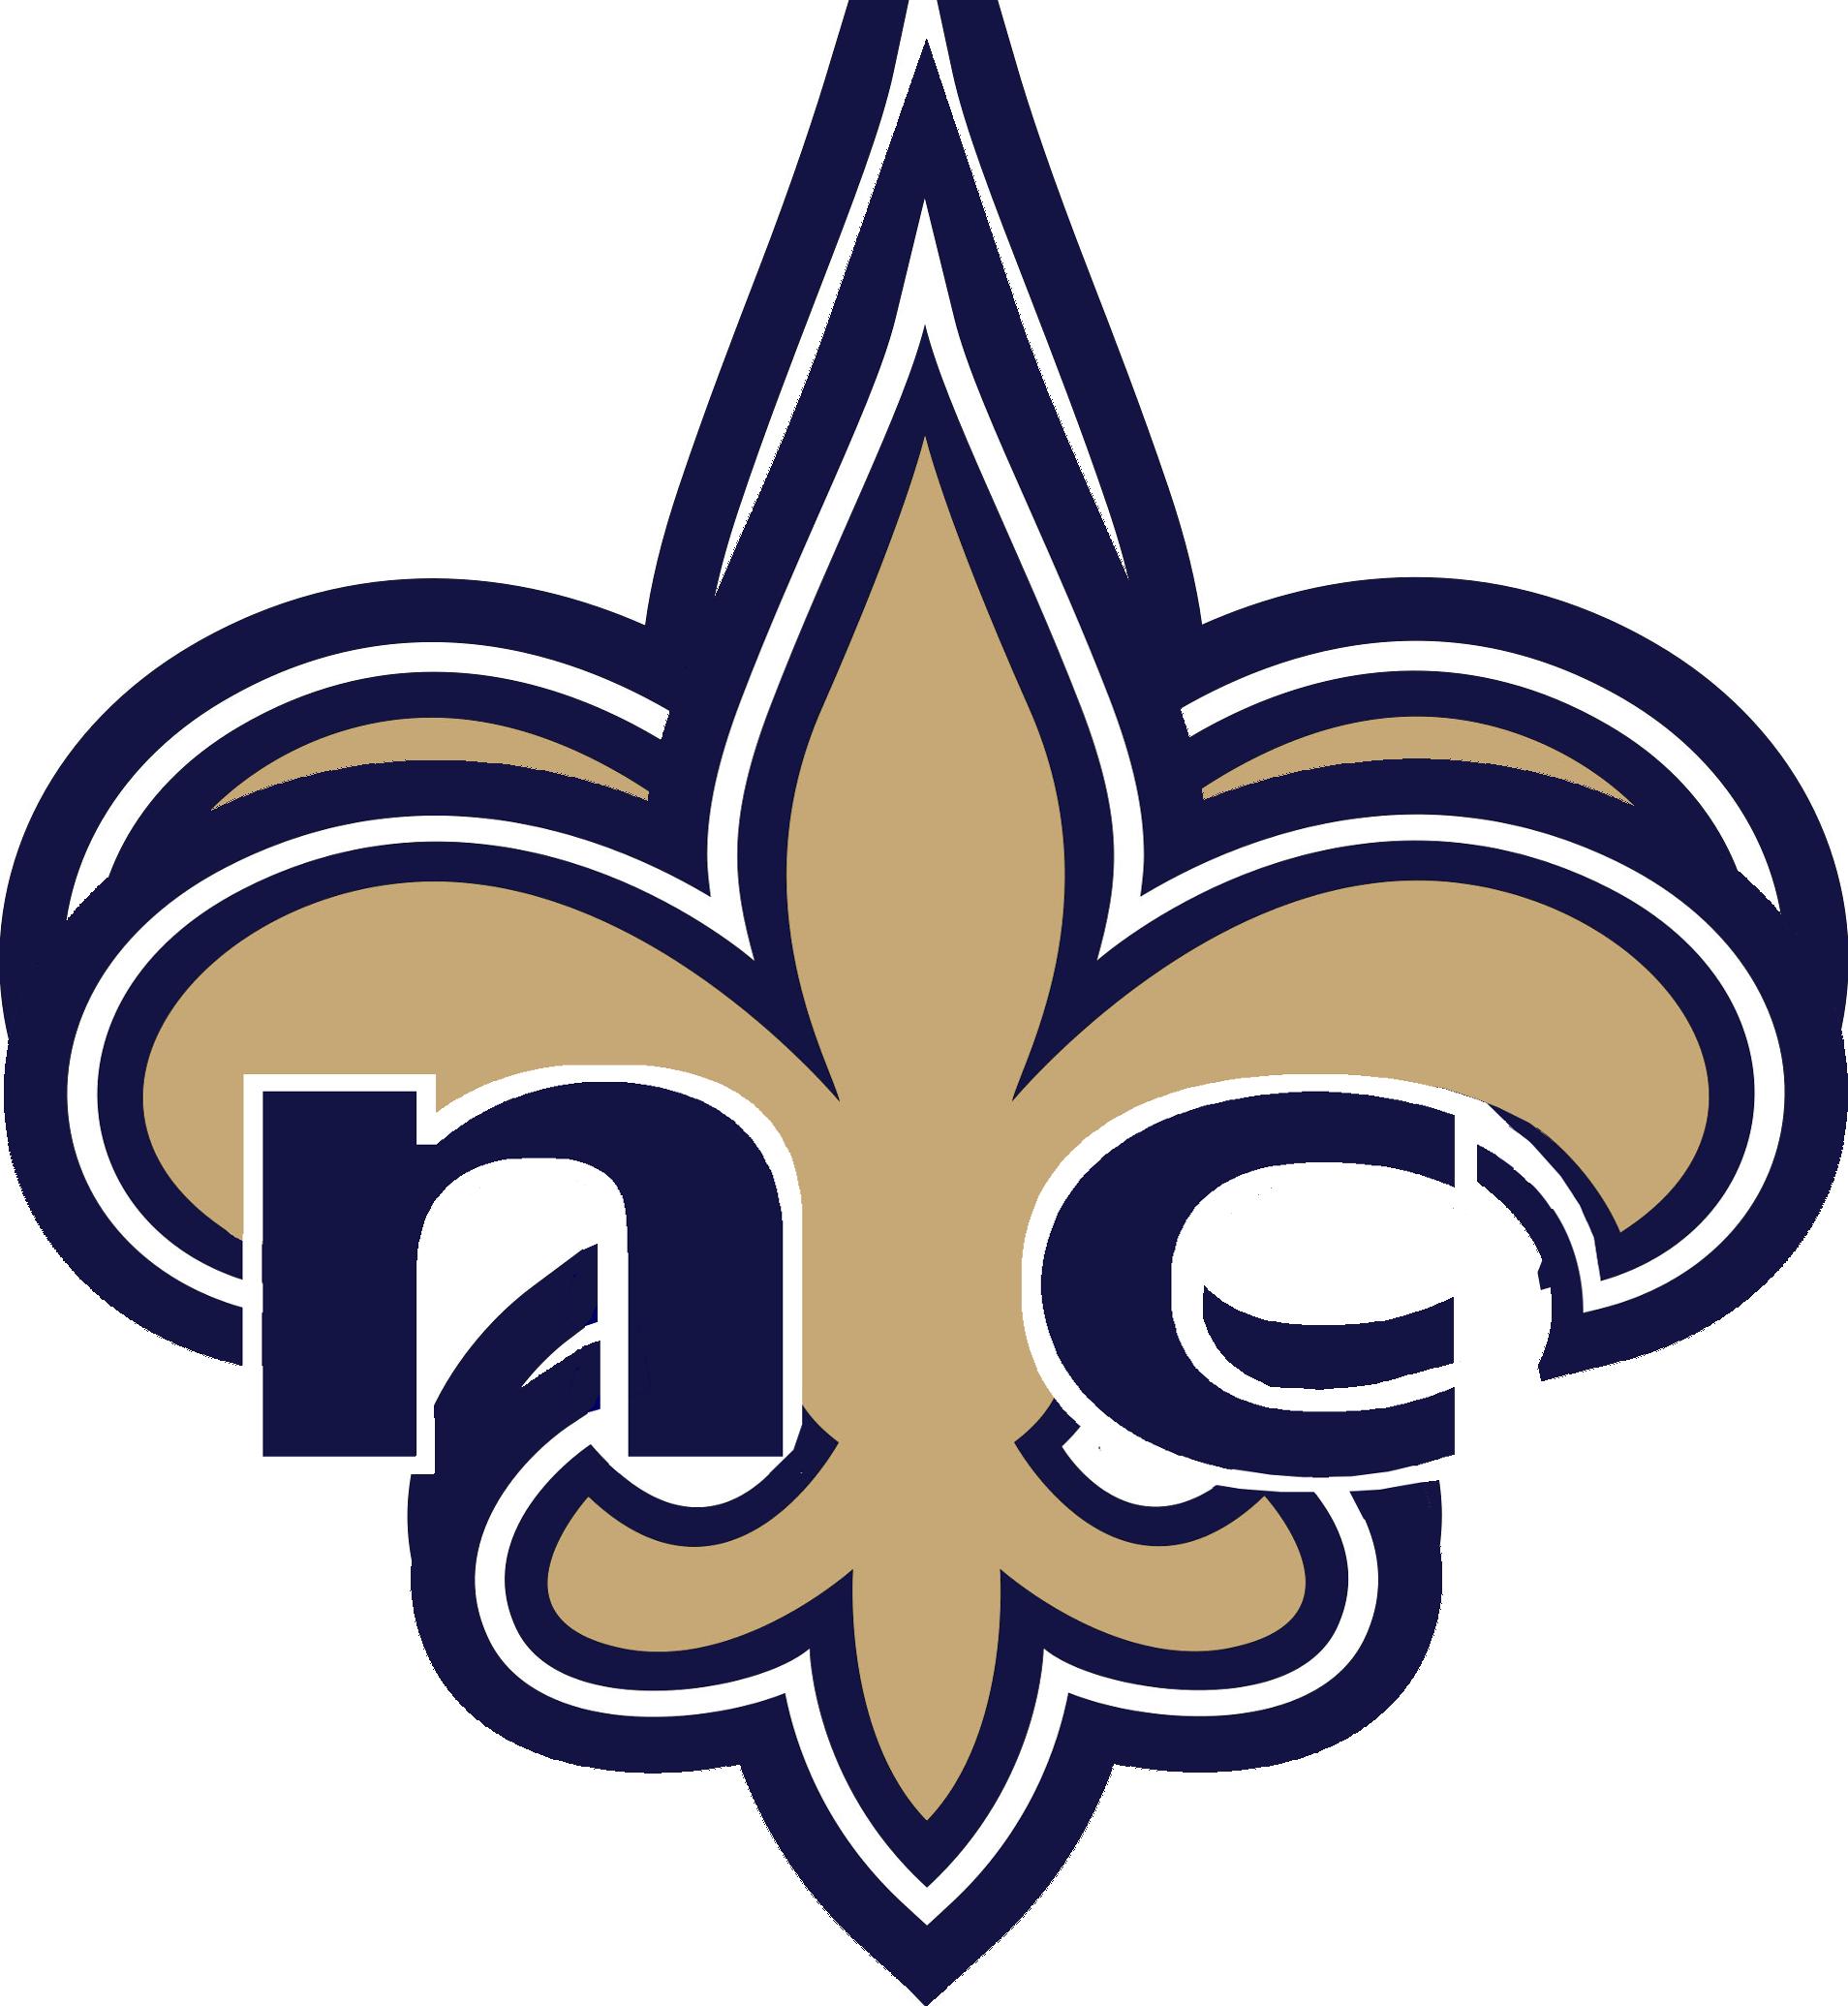 Saints football logo clipart jpg royalty free stock Home jpg royalty free stock